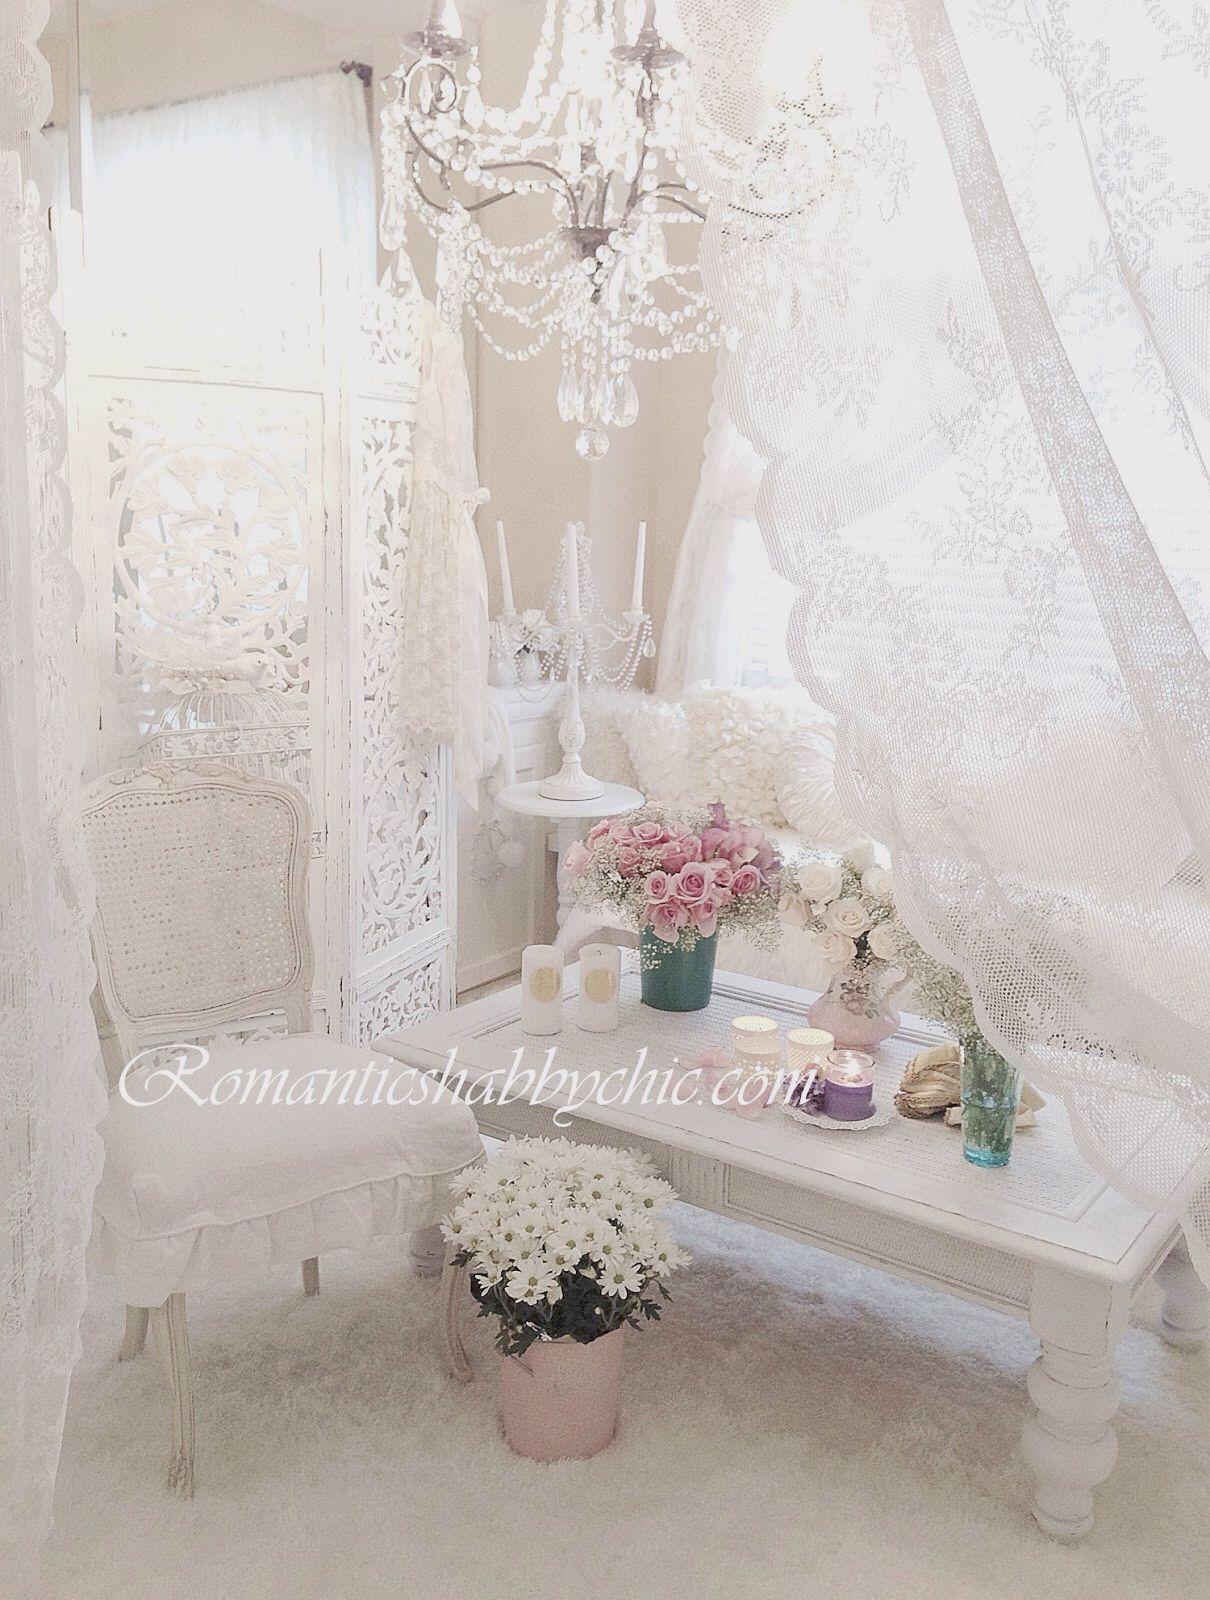 Romantike… | Romantic shabby chic, Shabby chic bedrooms ...